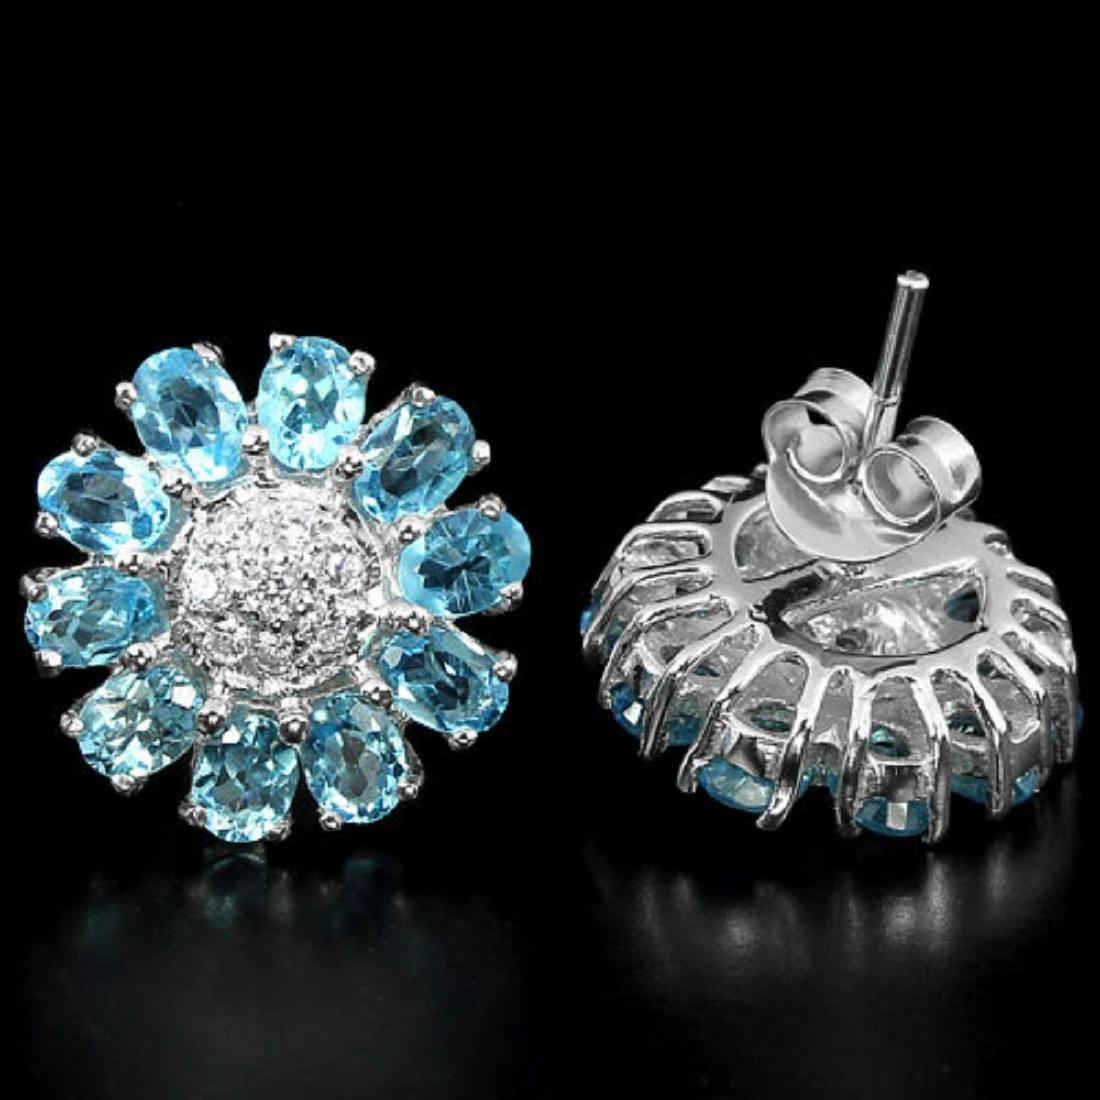 Natural Swiss Topaz Earrings - 2